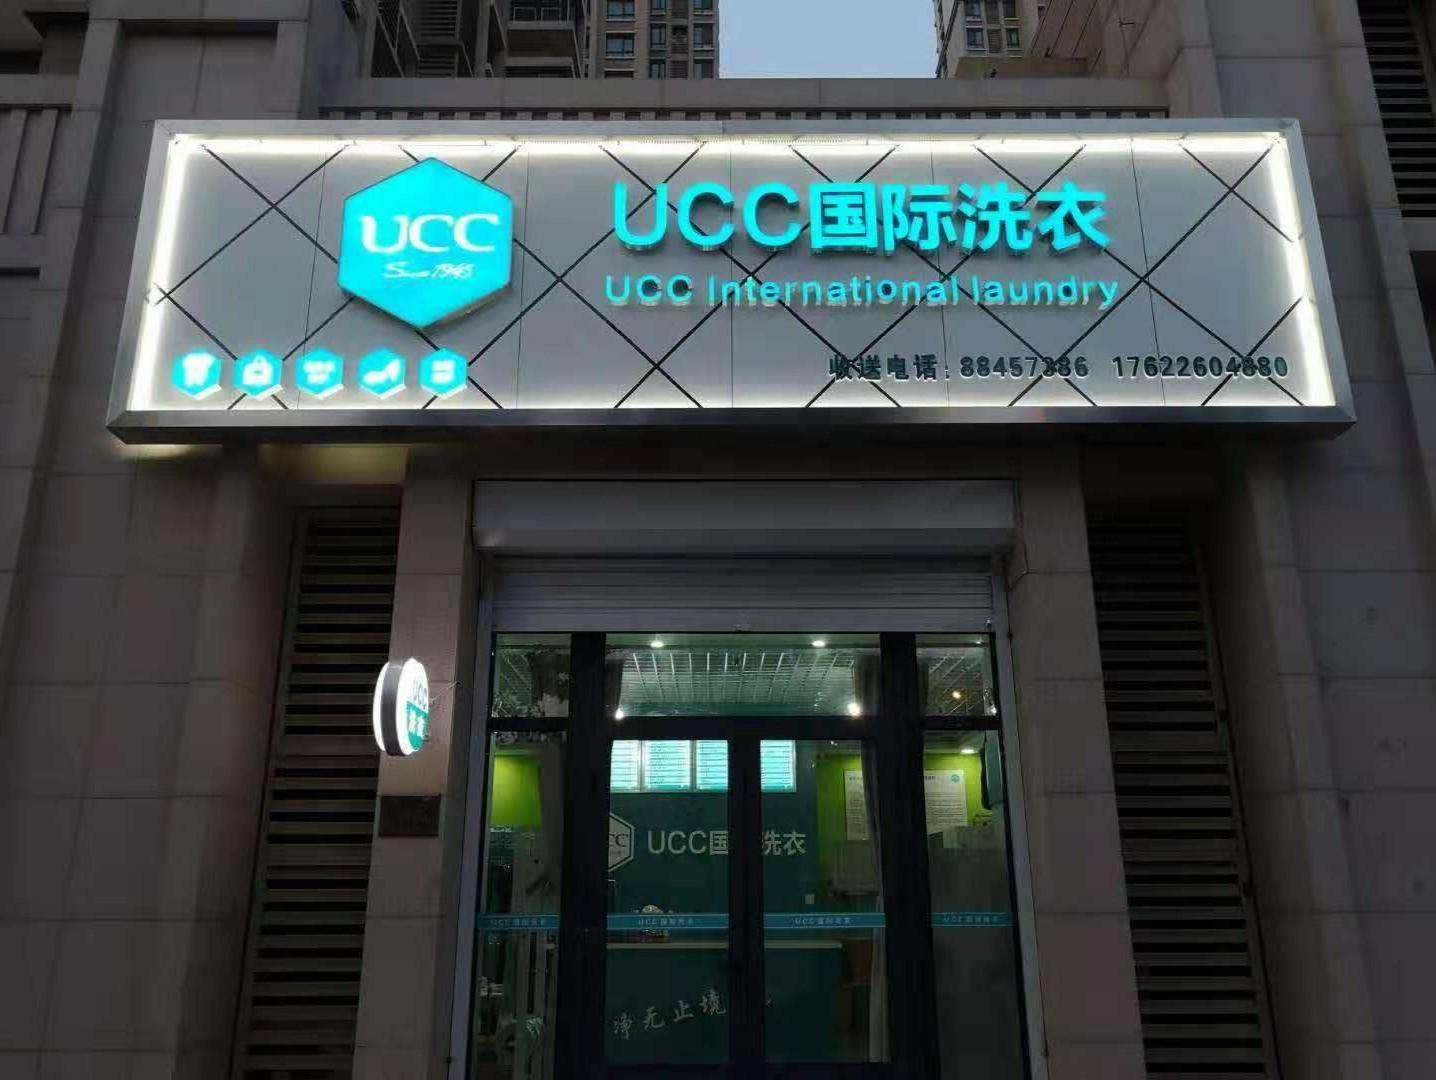 ucc国际洗衣开店可行吗?怎样选择店铺地址?